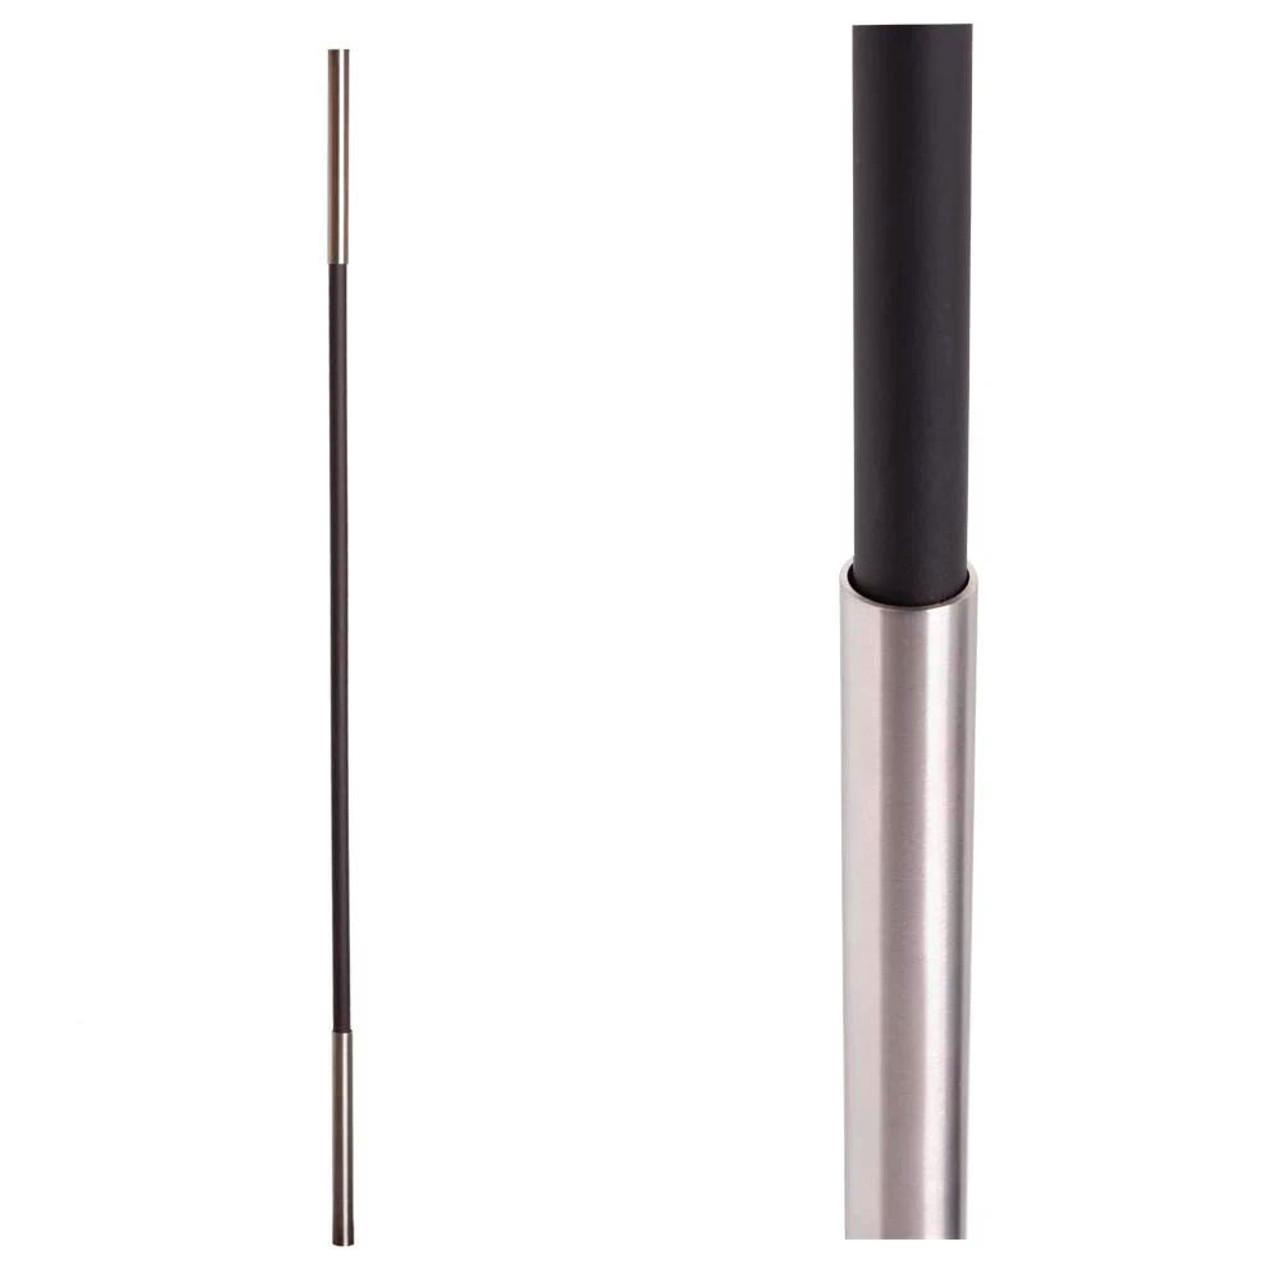 SoHo - Stainless Steel Base on Satin Black Baluster (17.4.1) Two Sleeves